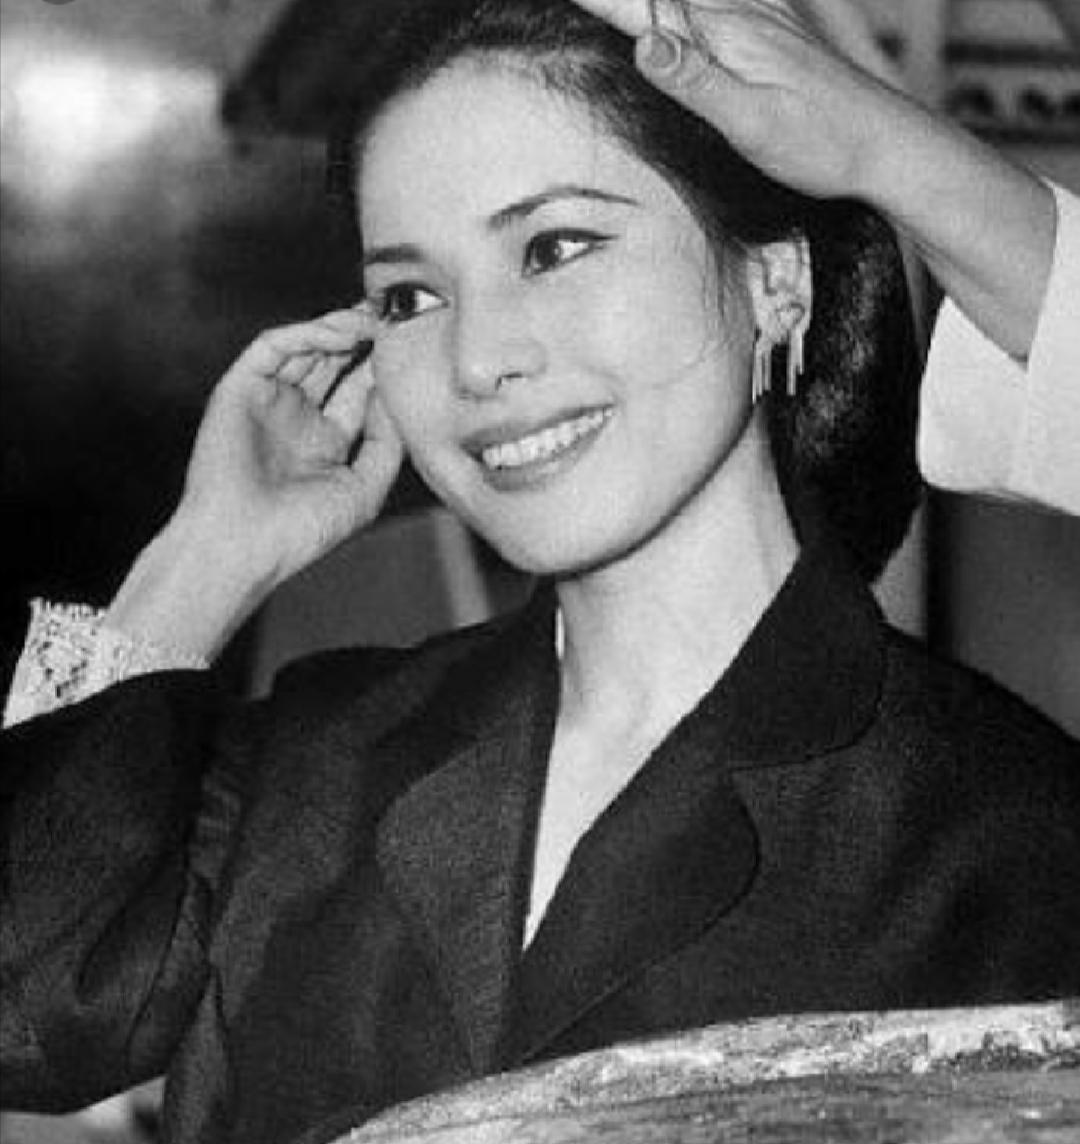 Kecantikan Dewi Soekarno Tak Lekang Dimakan Usia Warganet Sekilas Mirip Nikita Mirzani Jatim Times